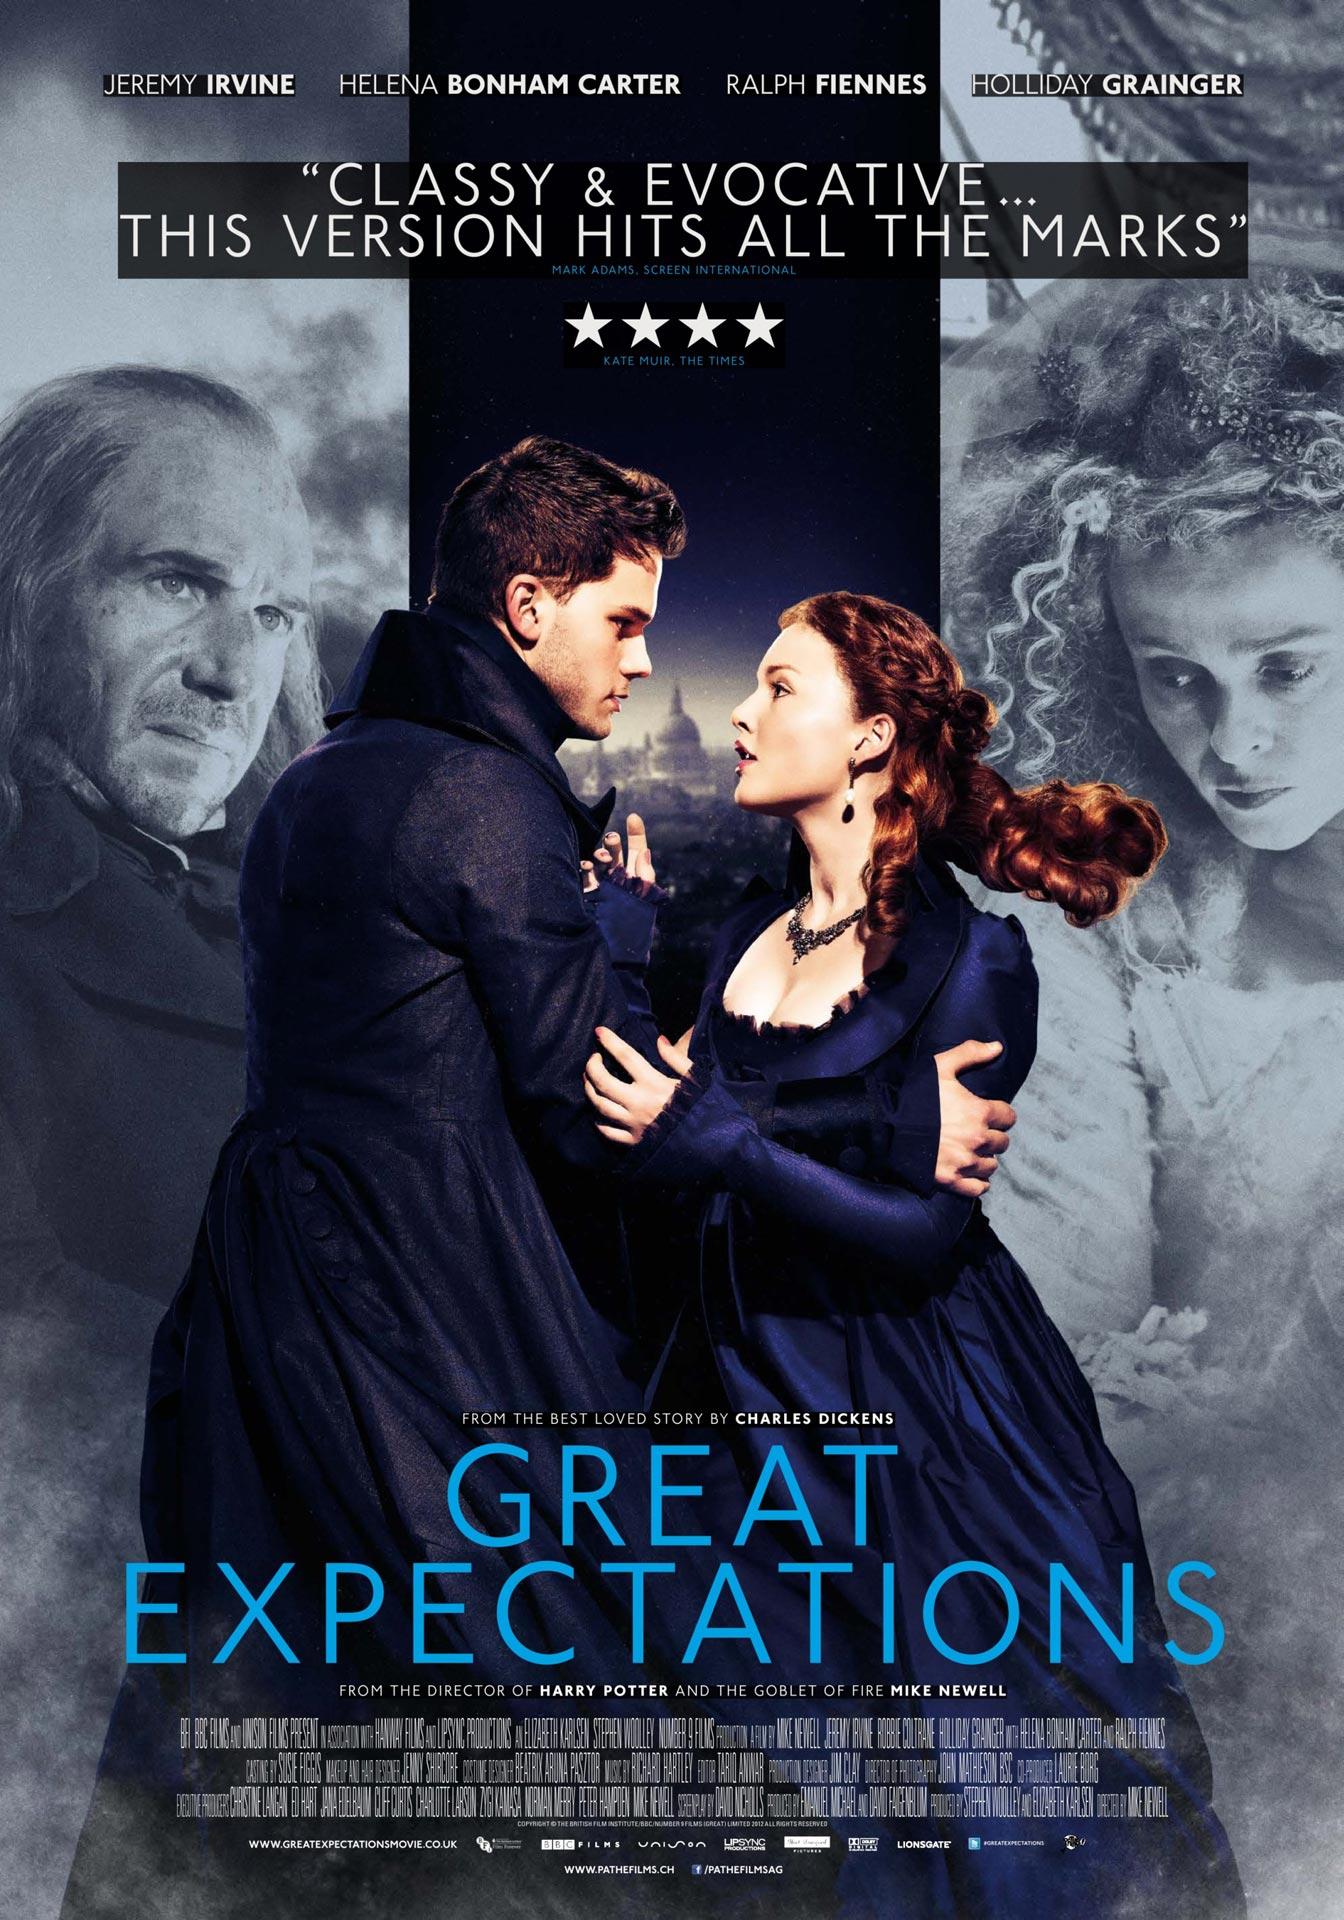 https://i0.wp.com/www.filmofilia.com/wp-content/uploads/2012/11/GREAT-EXPECTATIONS-Poster.jpg